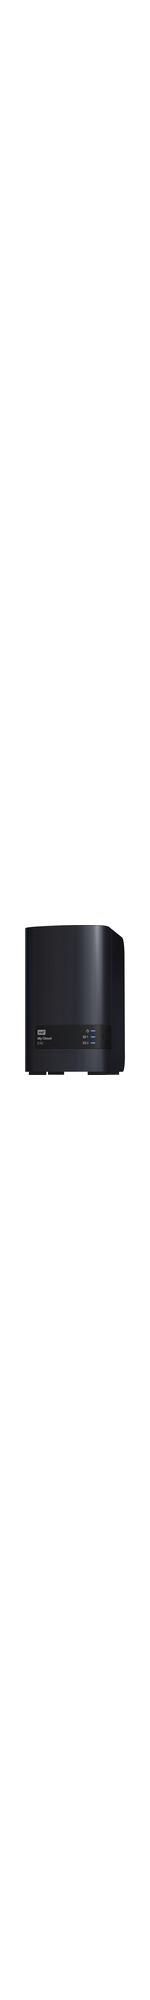 WD My Cloud EX2 WDBVBZ0040JCH-EESN 2 x Total Bays NAS Server